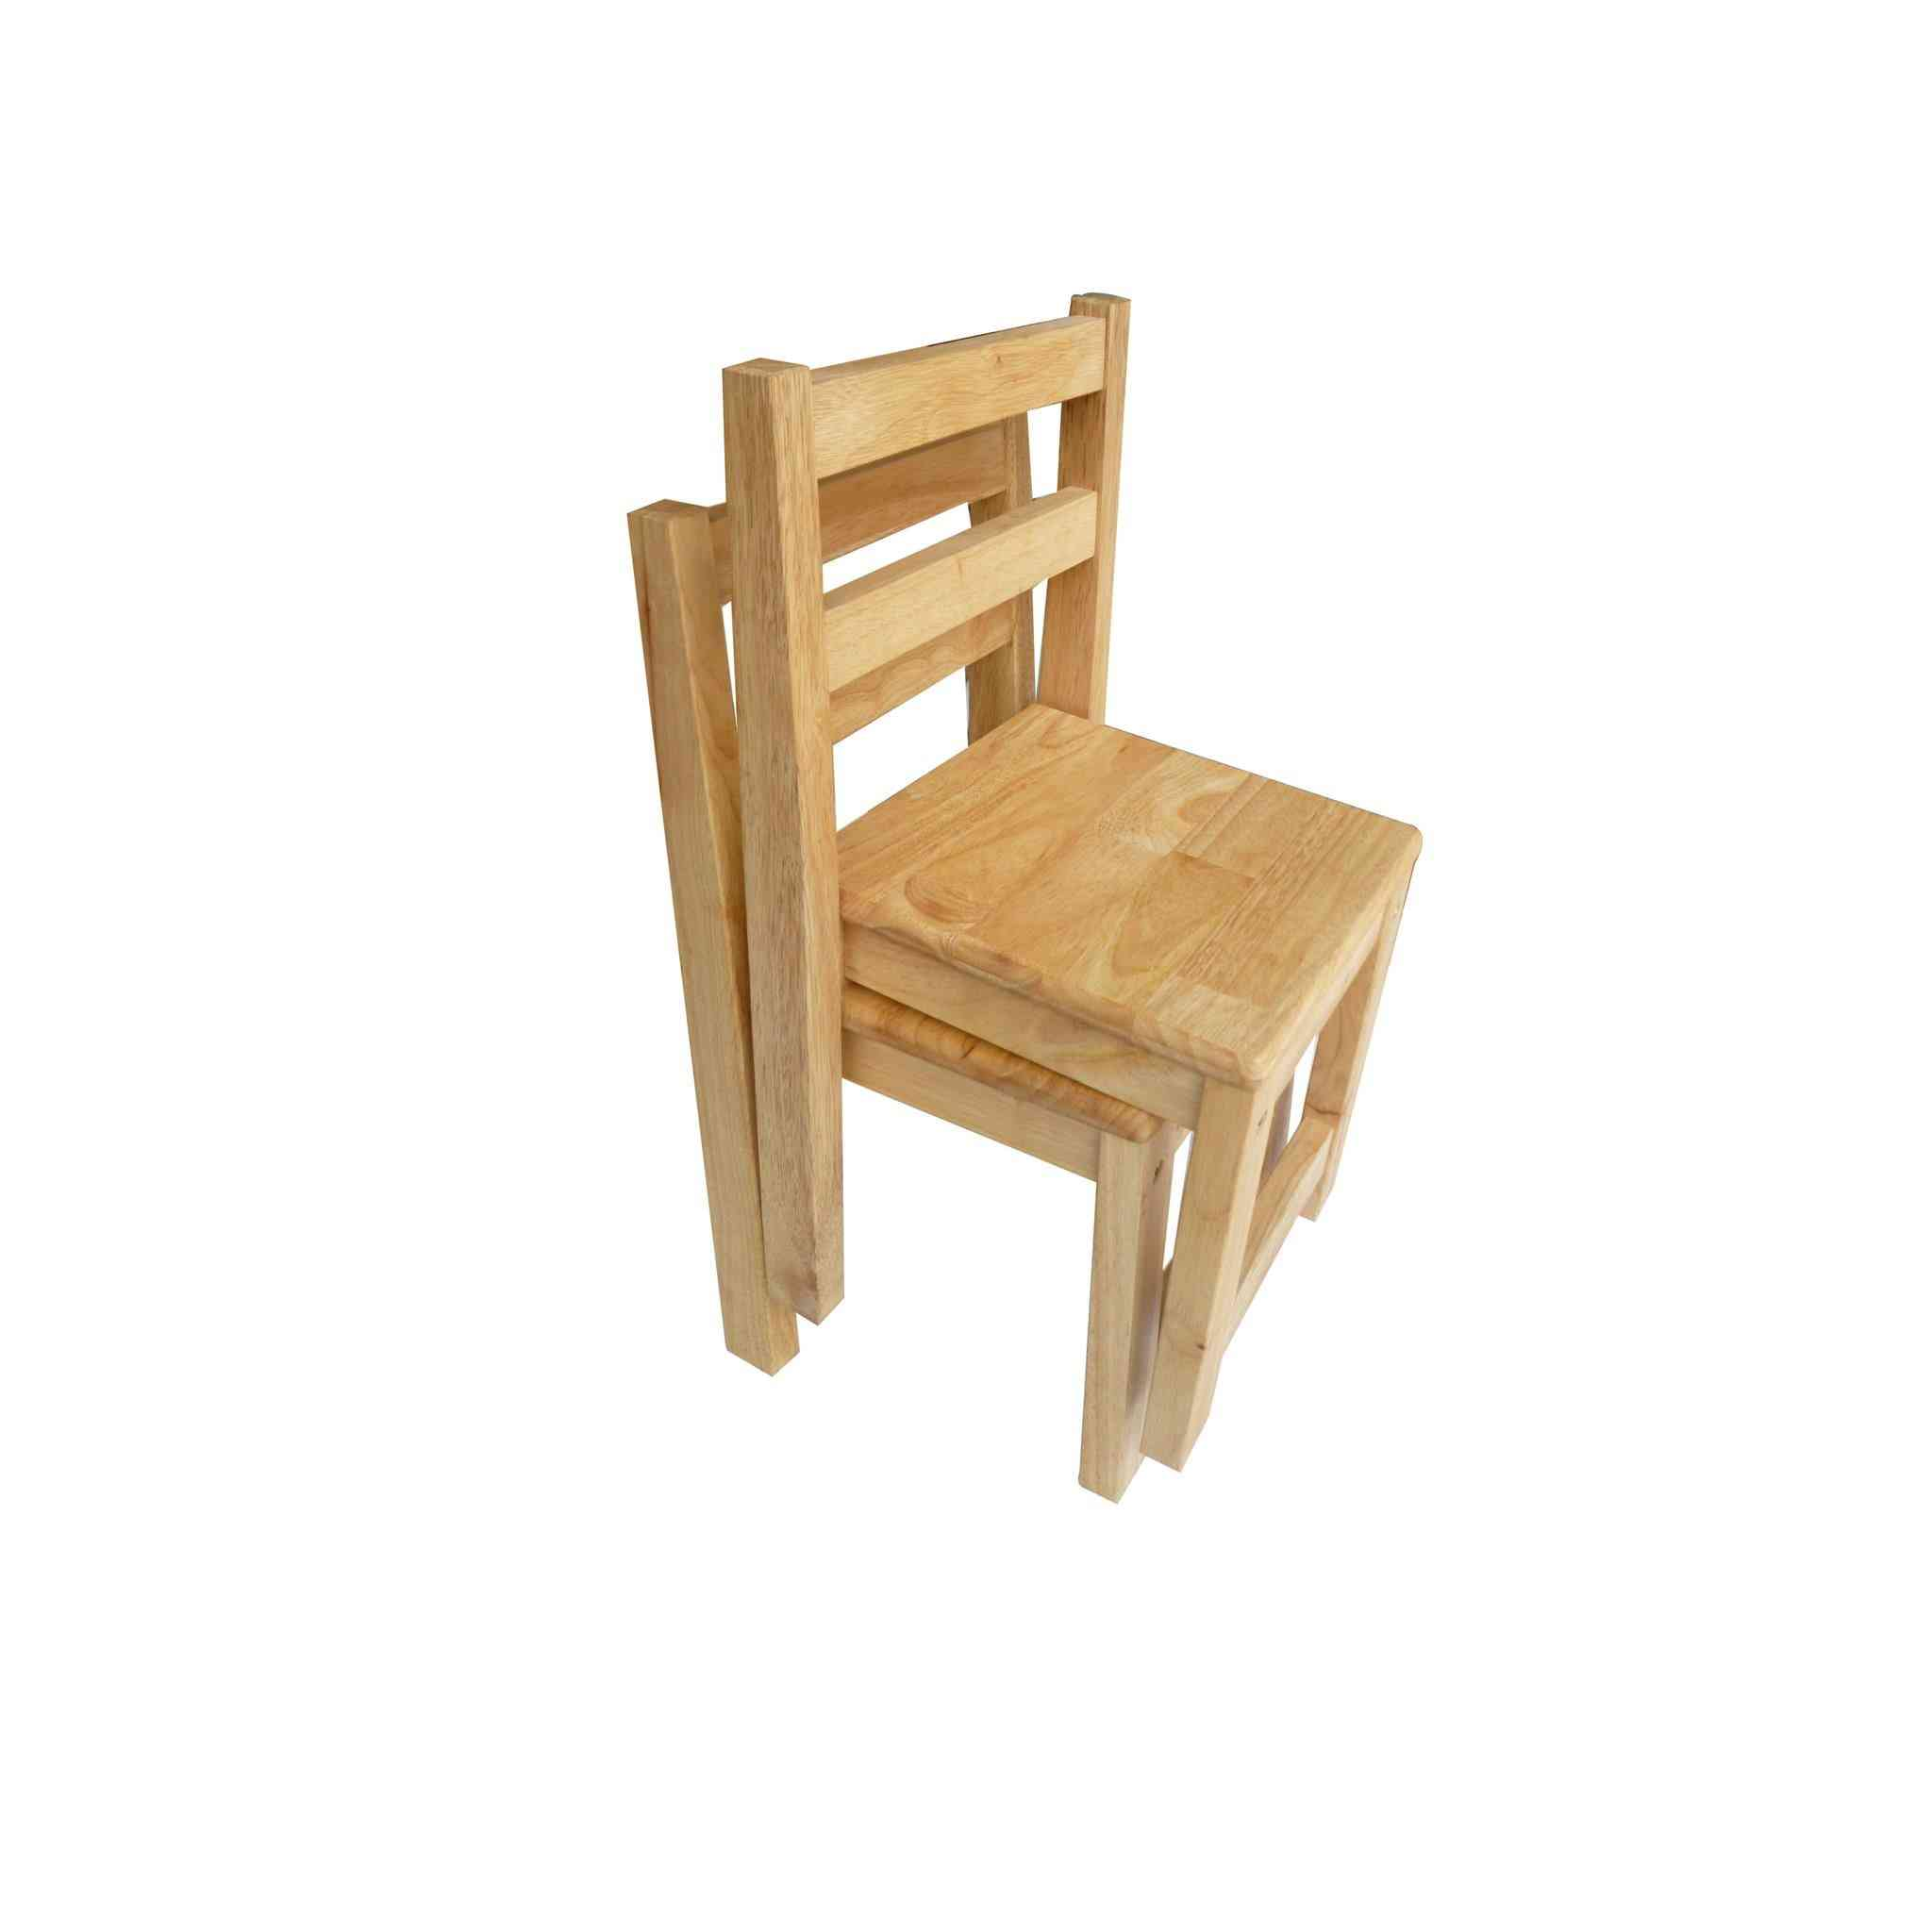 Qtoys Australia Standard Chairs - Rubberwood